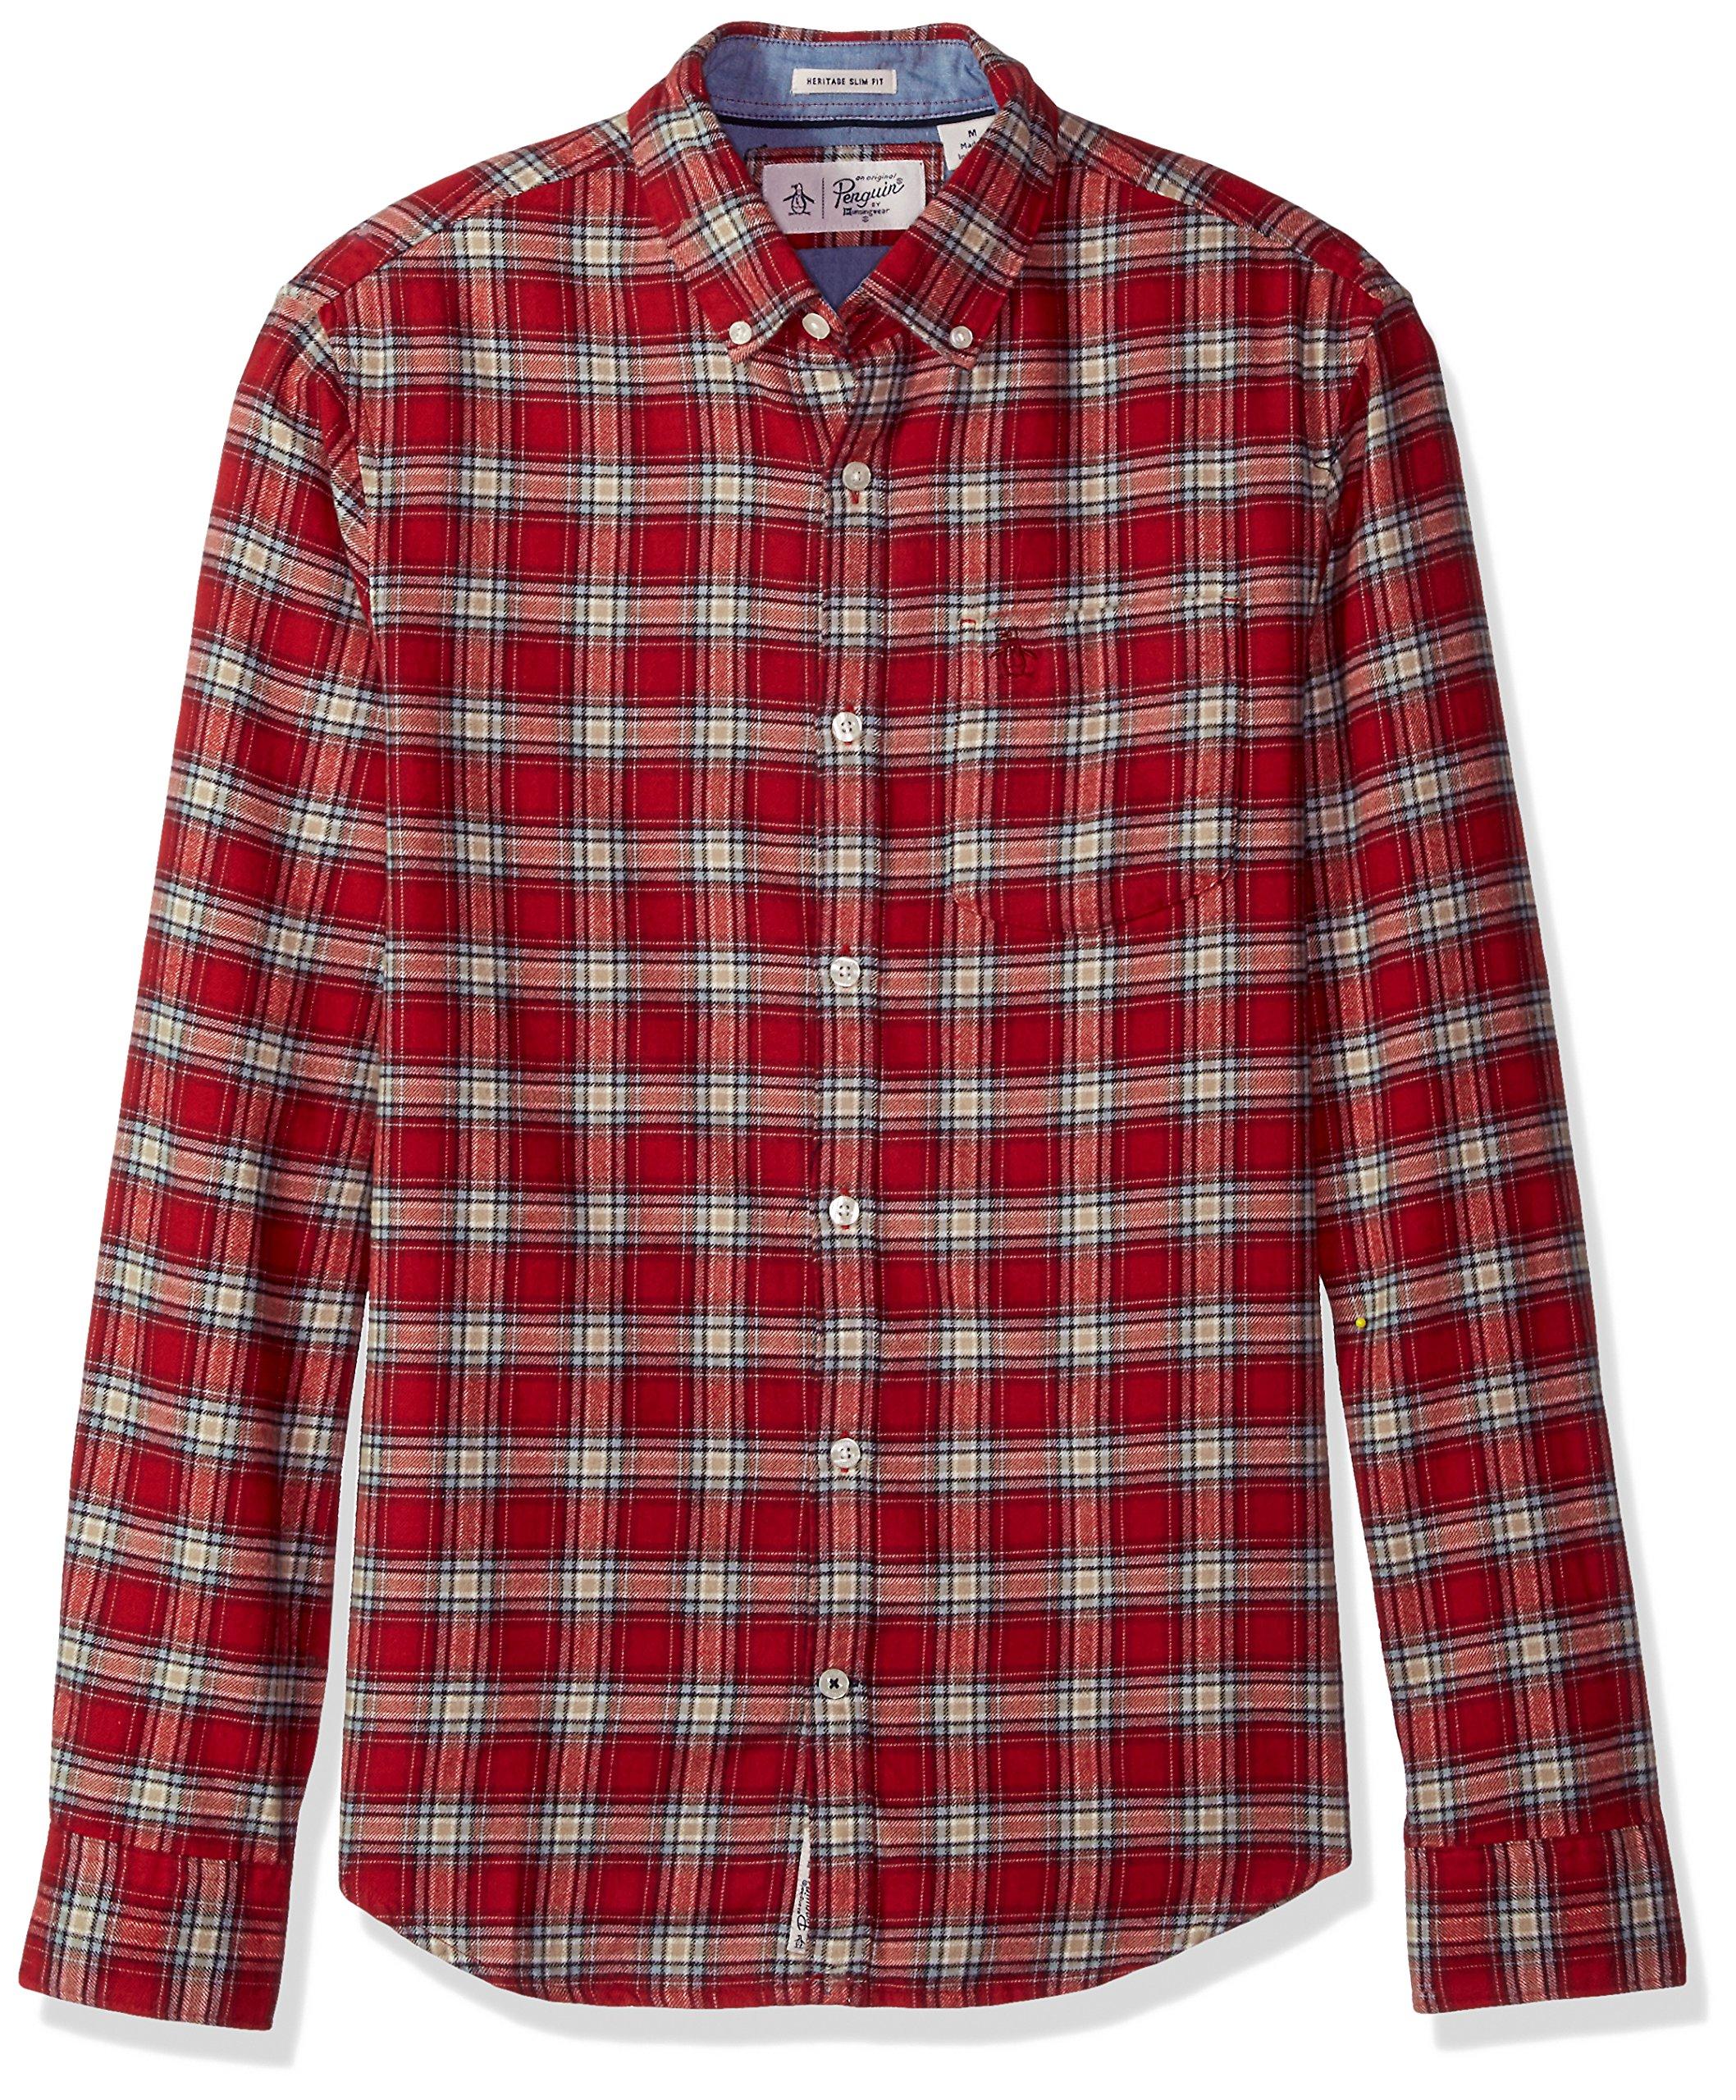 Original Penguin Men's Flannel Plaid Dress Shirt, Pomegranate, Medium